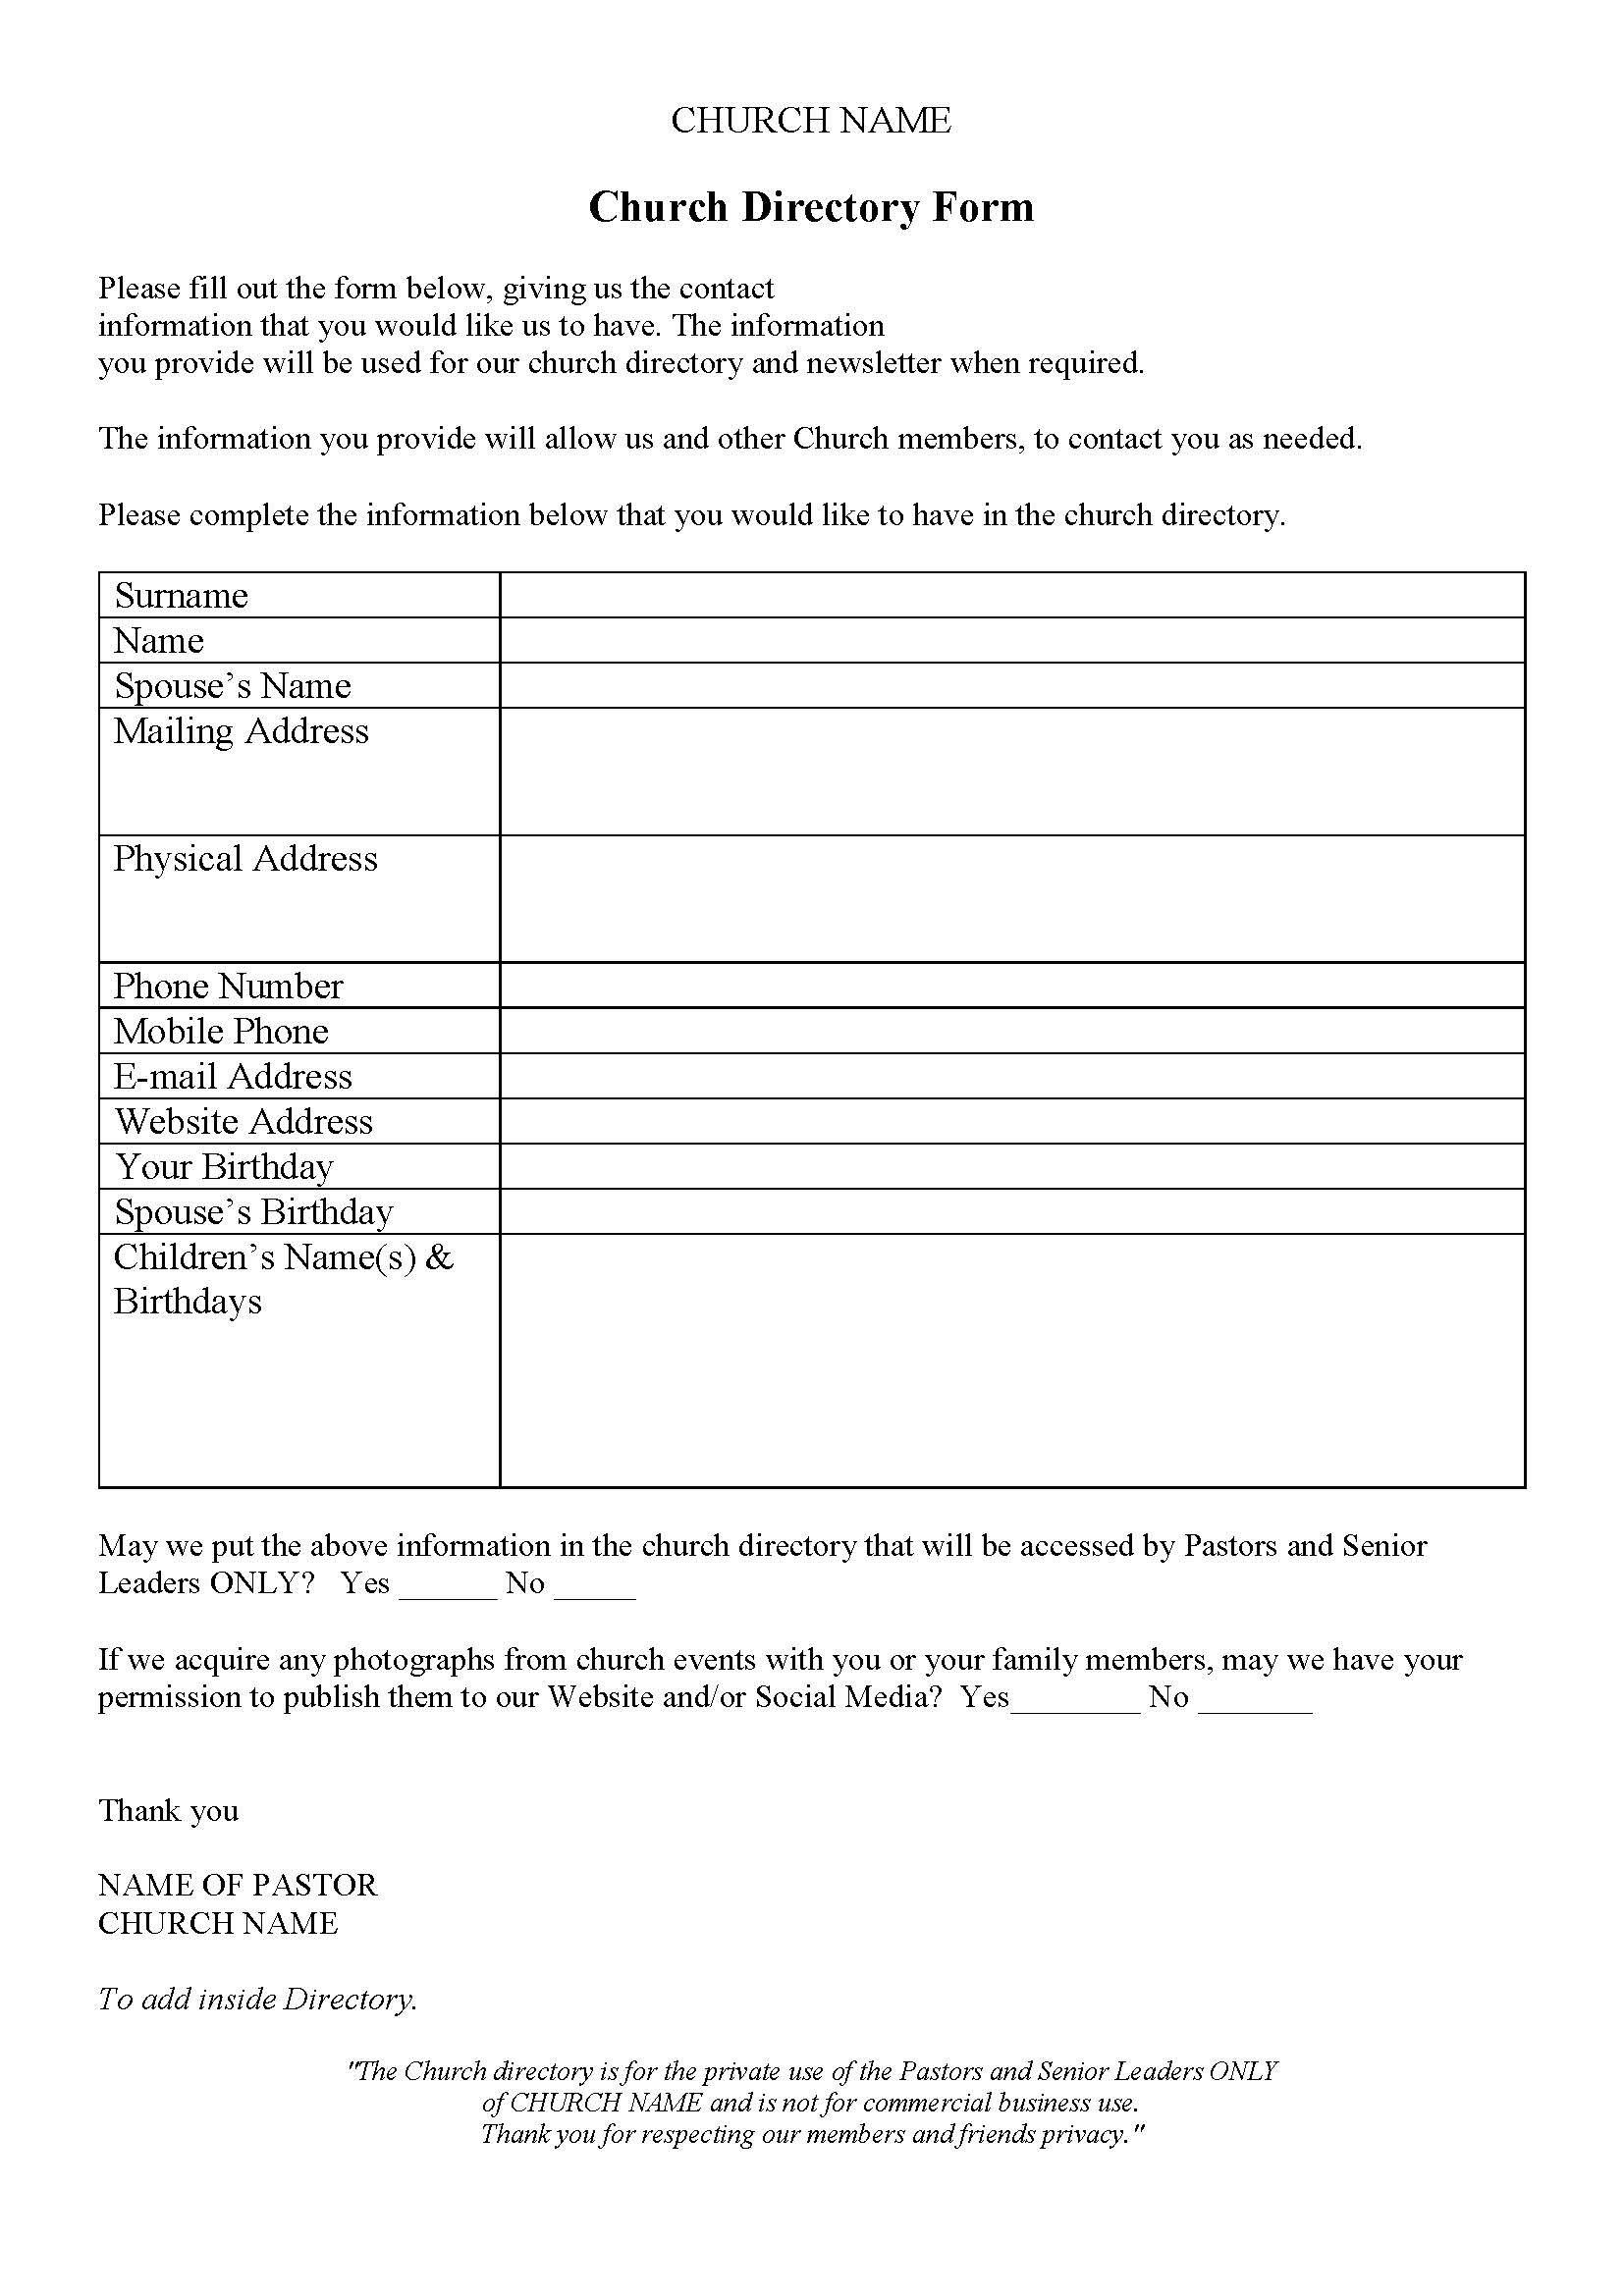 Church Directory | Church Directory Ideas | Pinterest | Church - Free Printable Church Directory Template